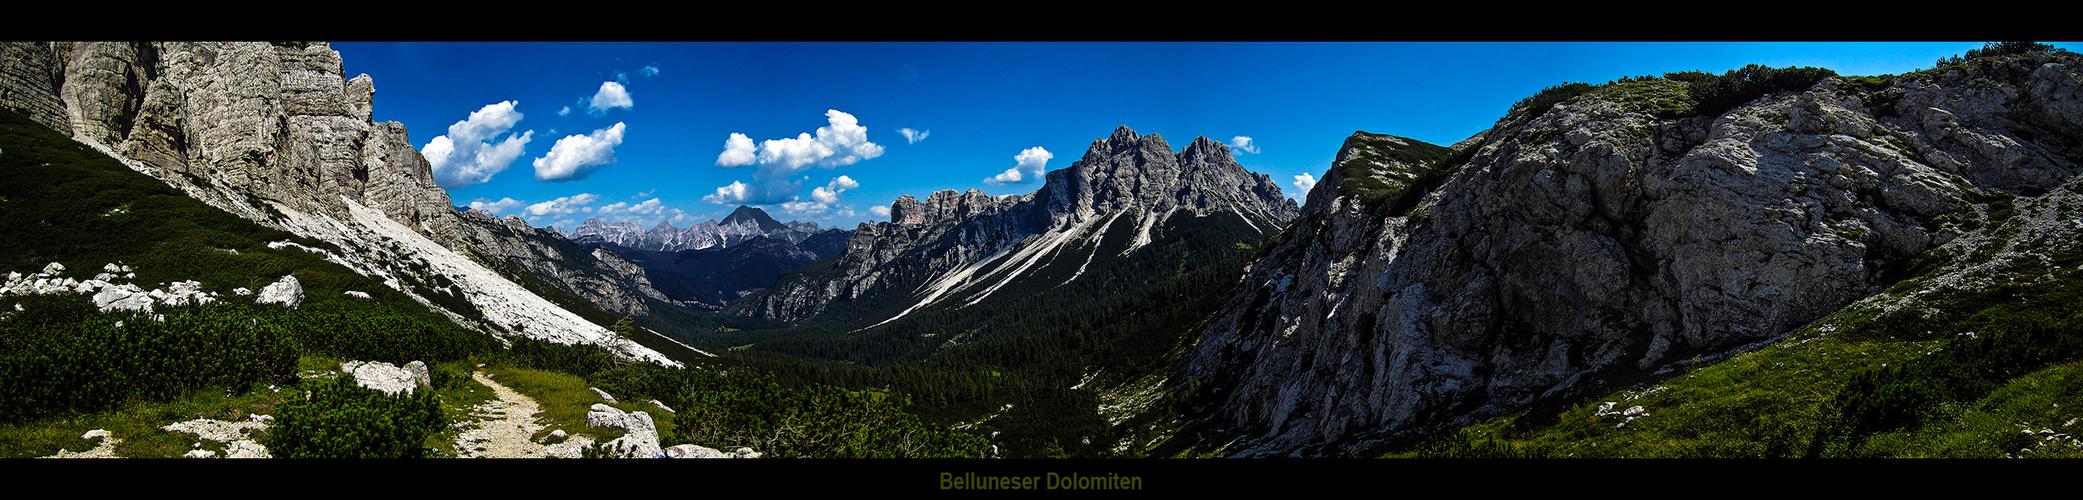 Belluneser Dolomiten